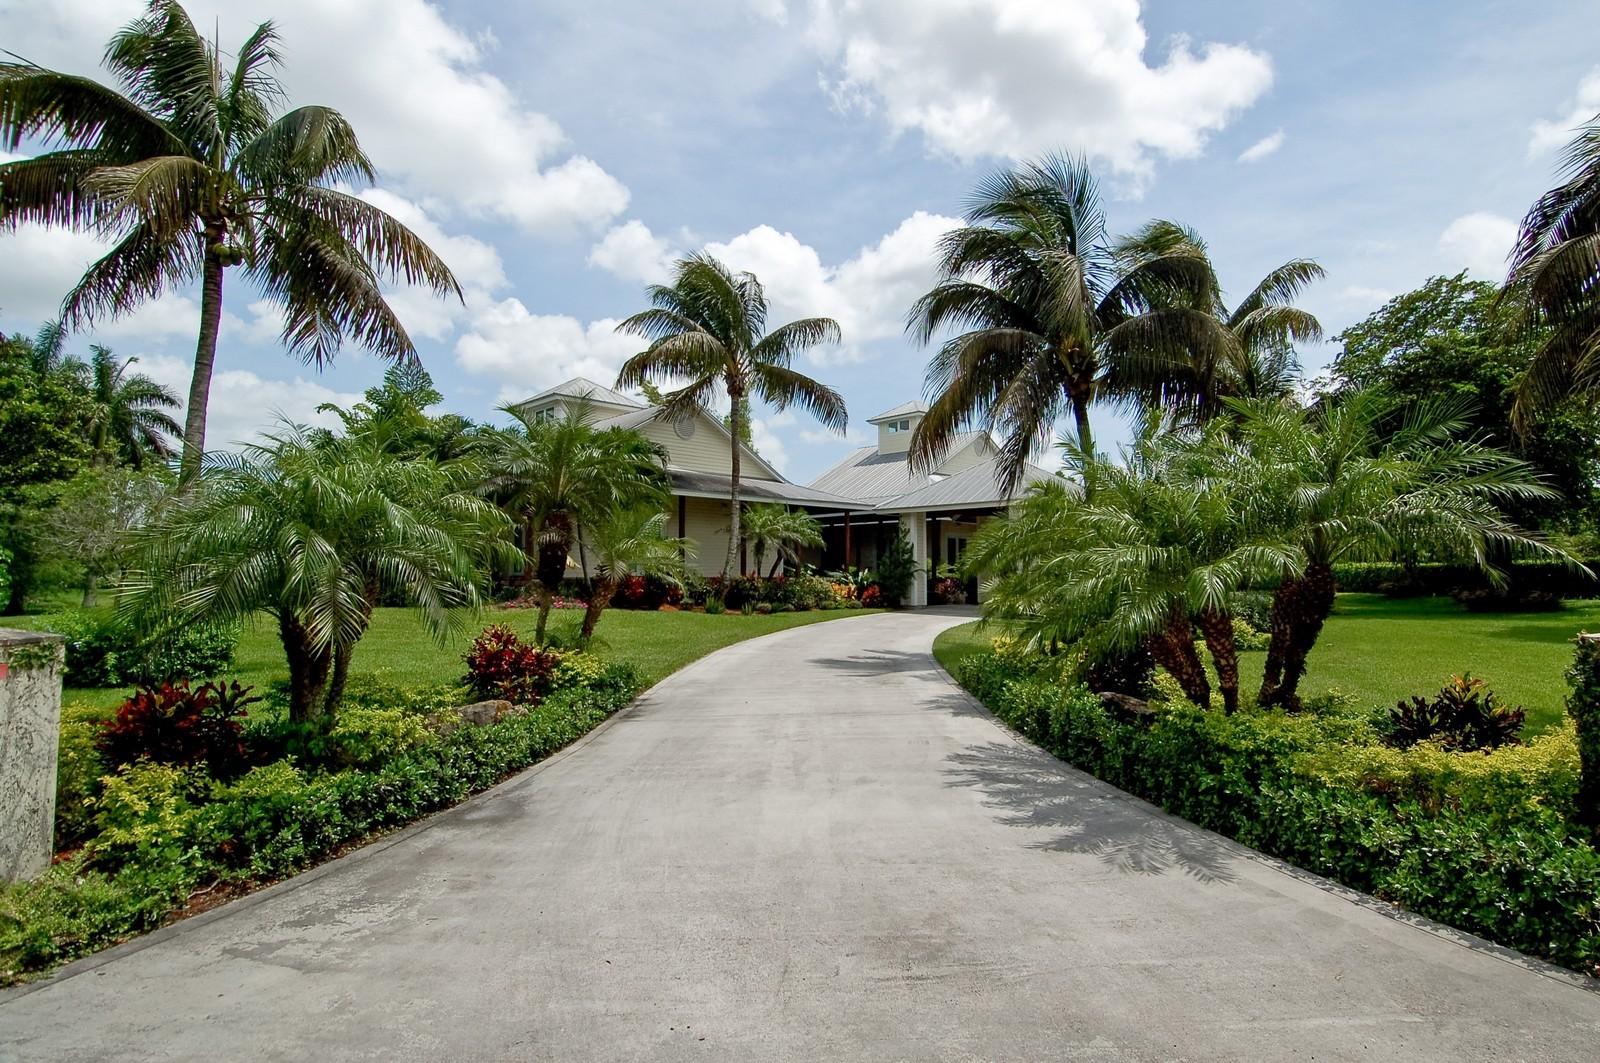 Real Estate Photography - 12800 SW 33RD DRIVE, DAVIE, FL, 33330 - Entrance